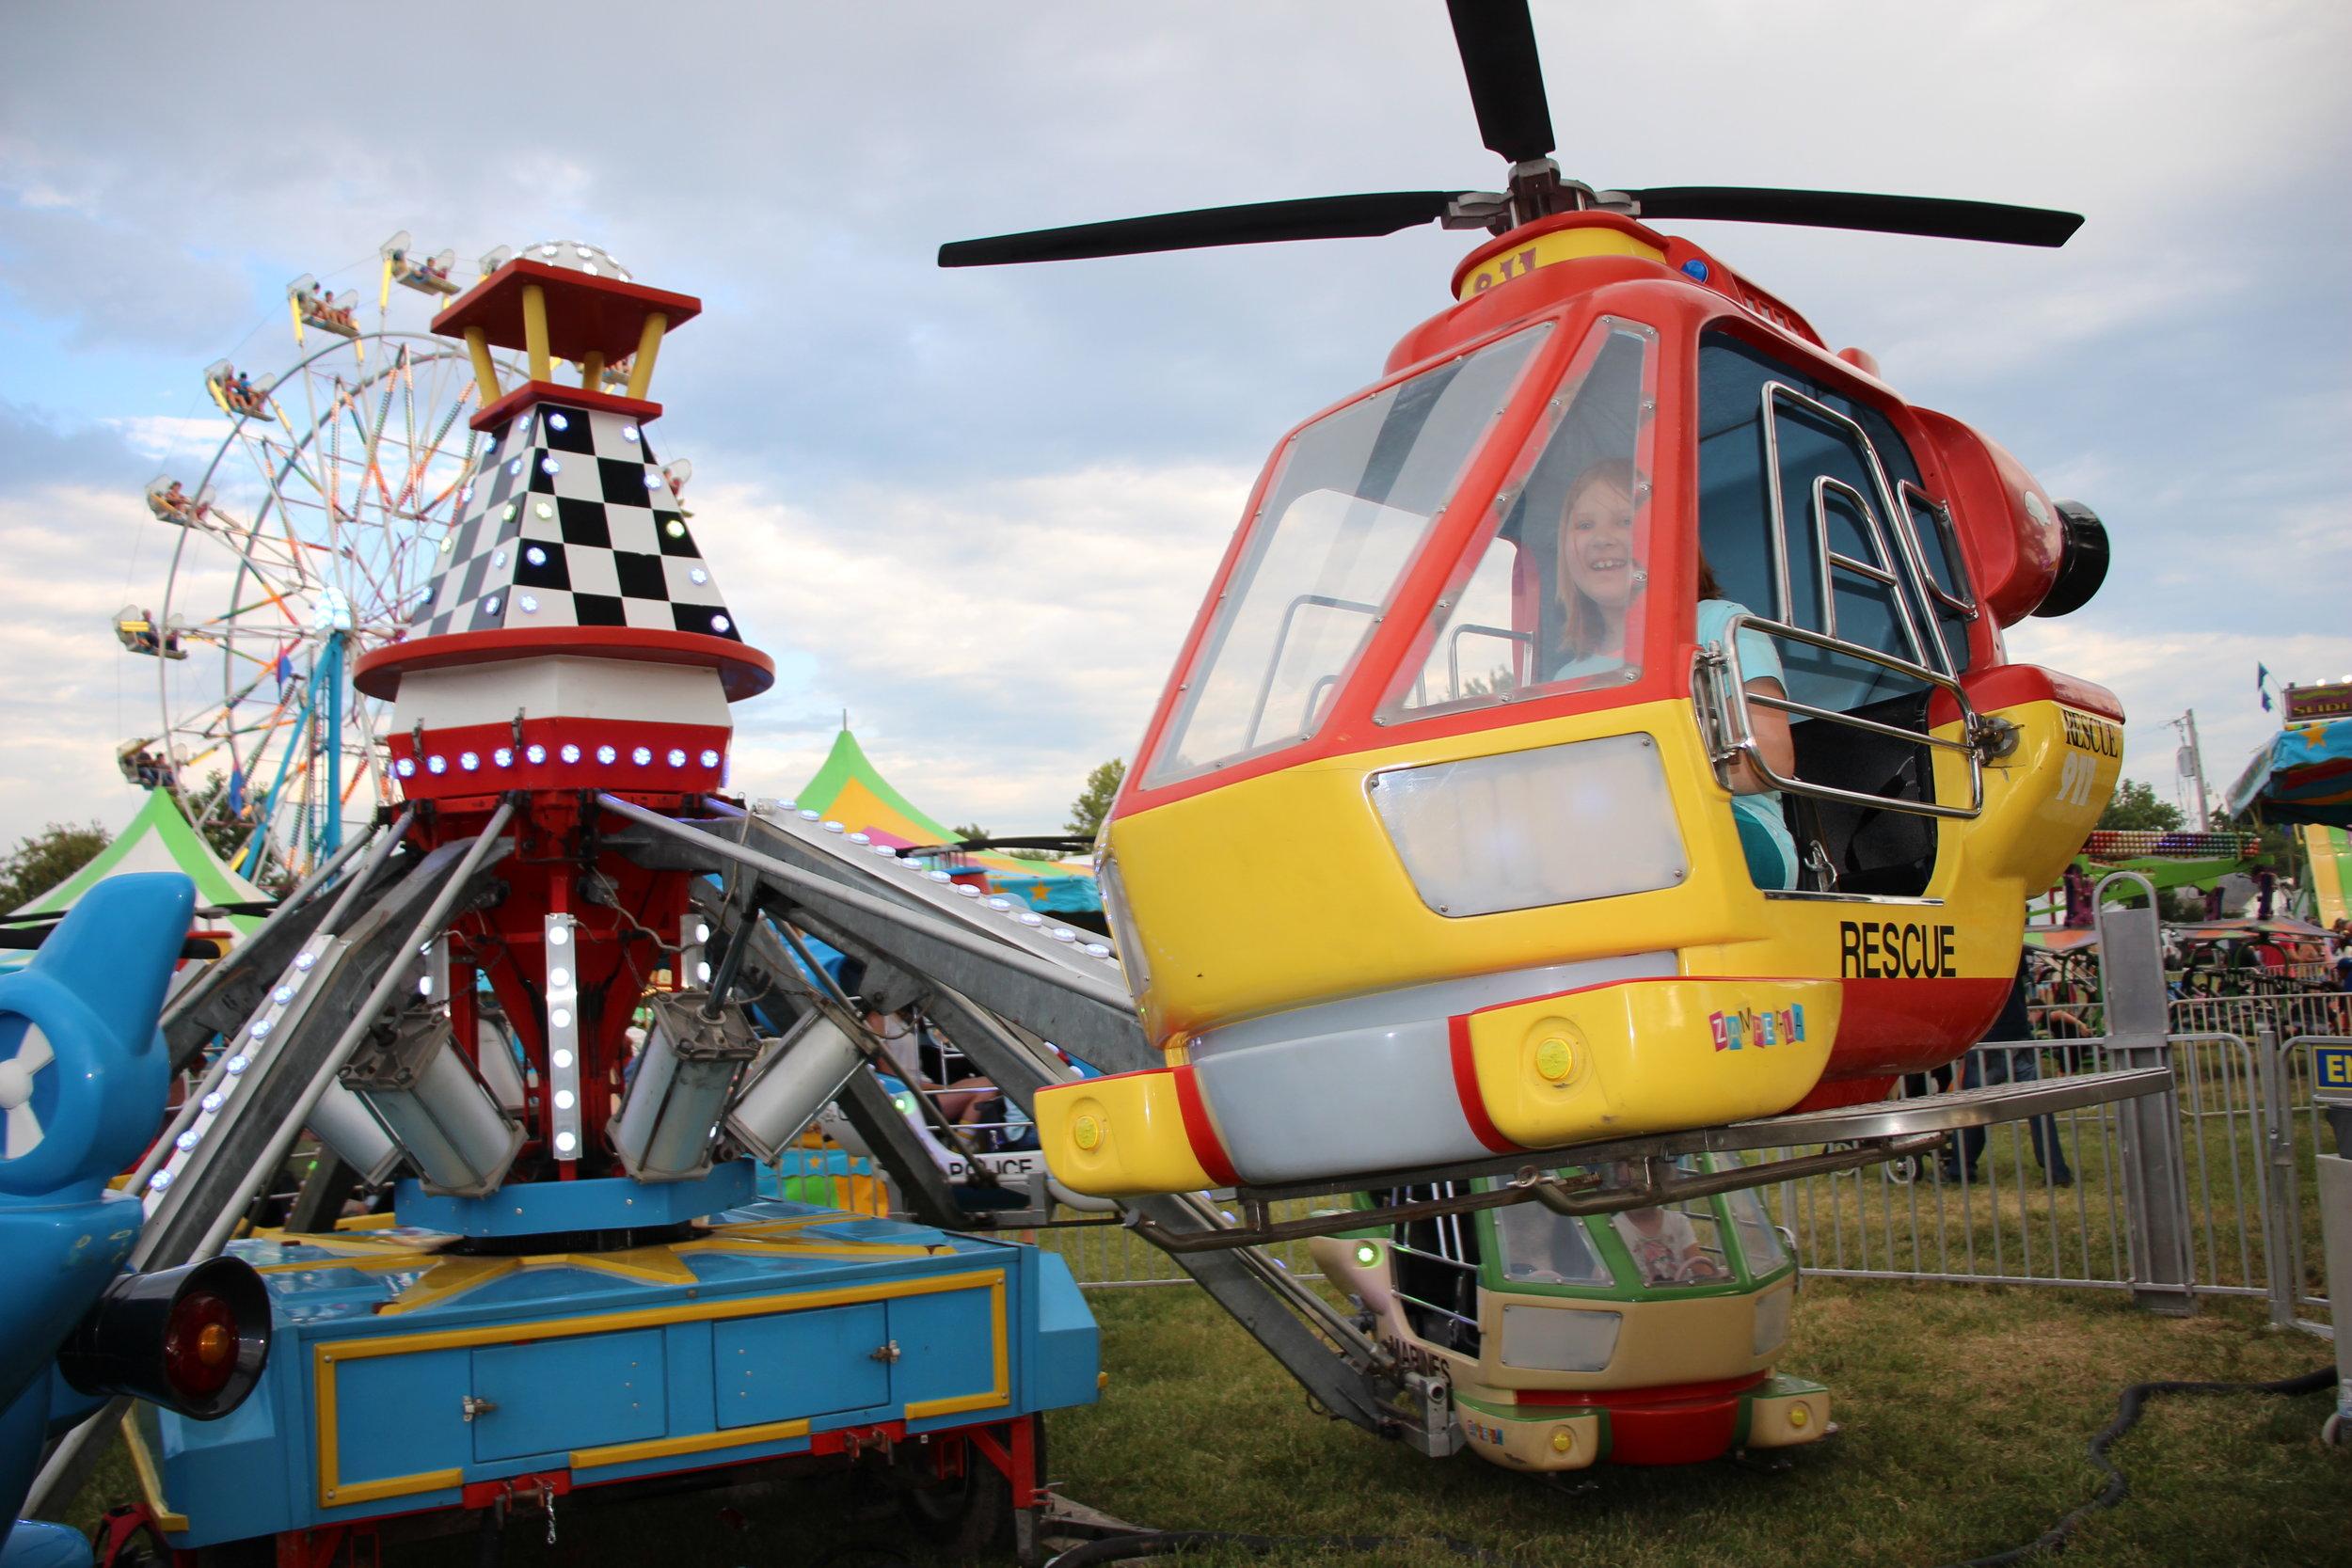 kiley in helicopter.JPG